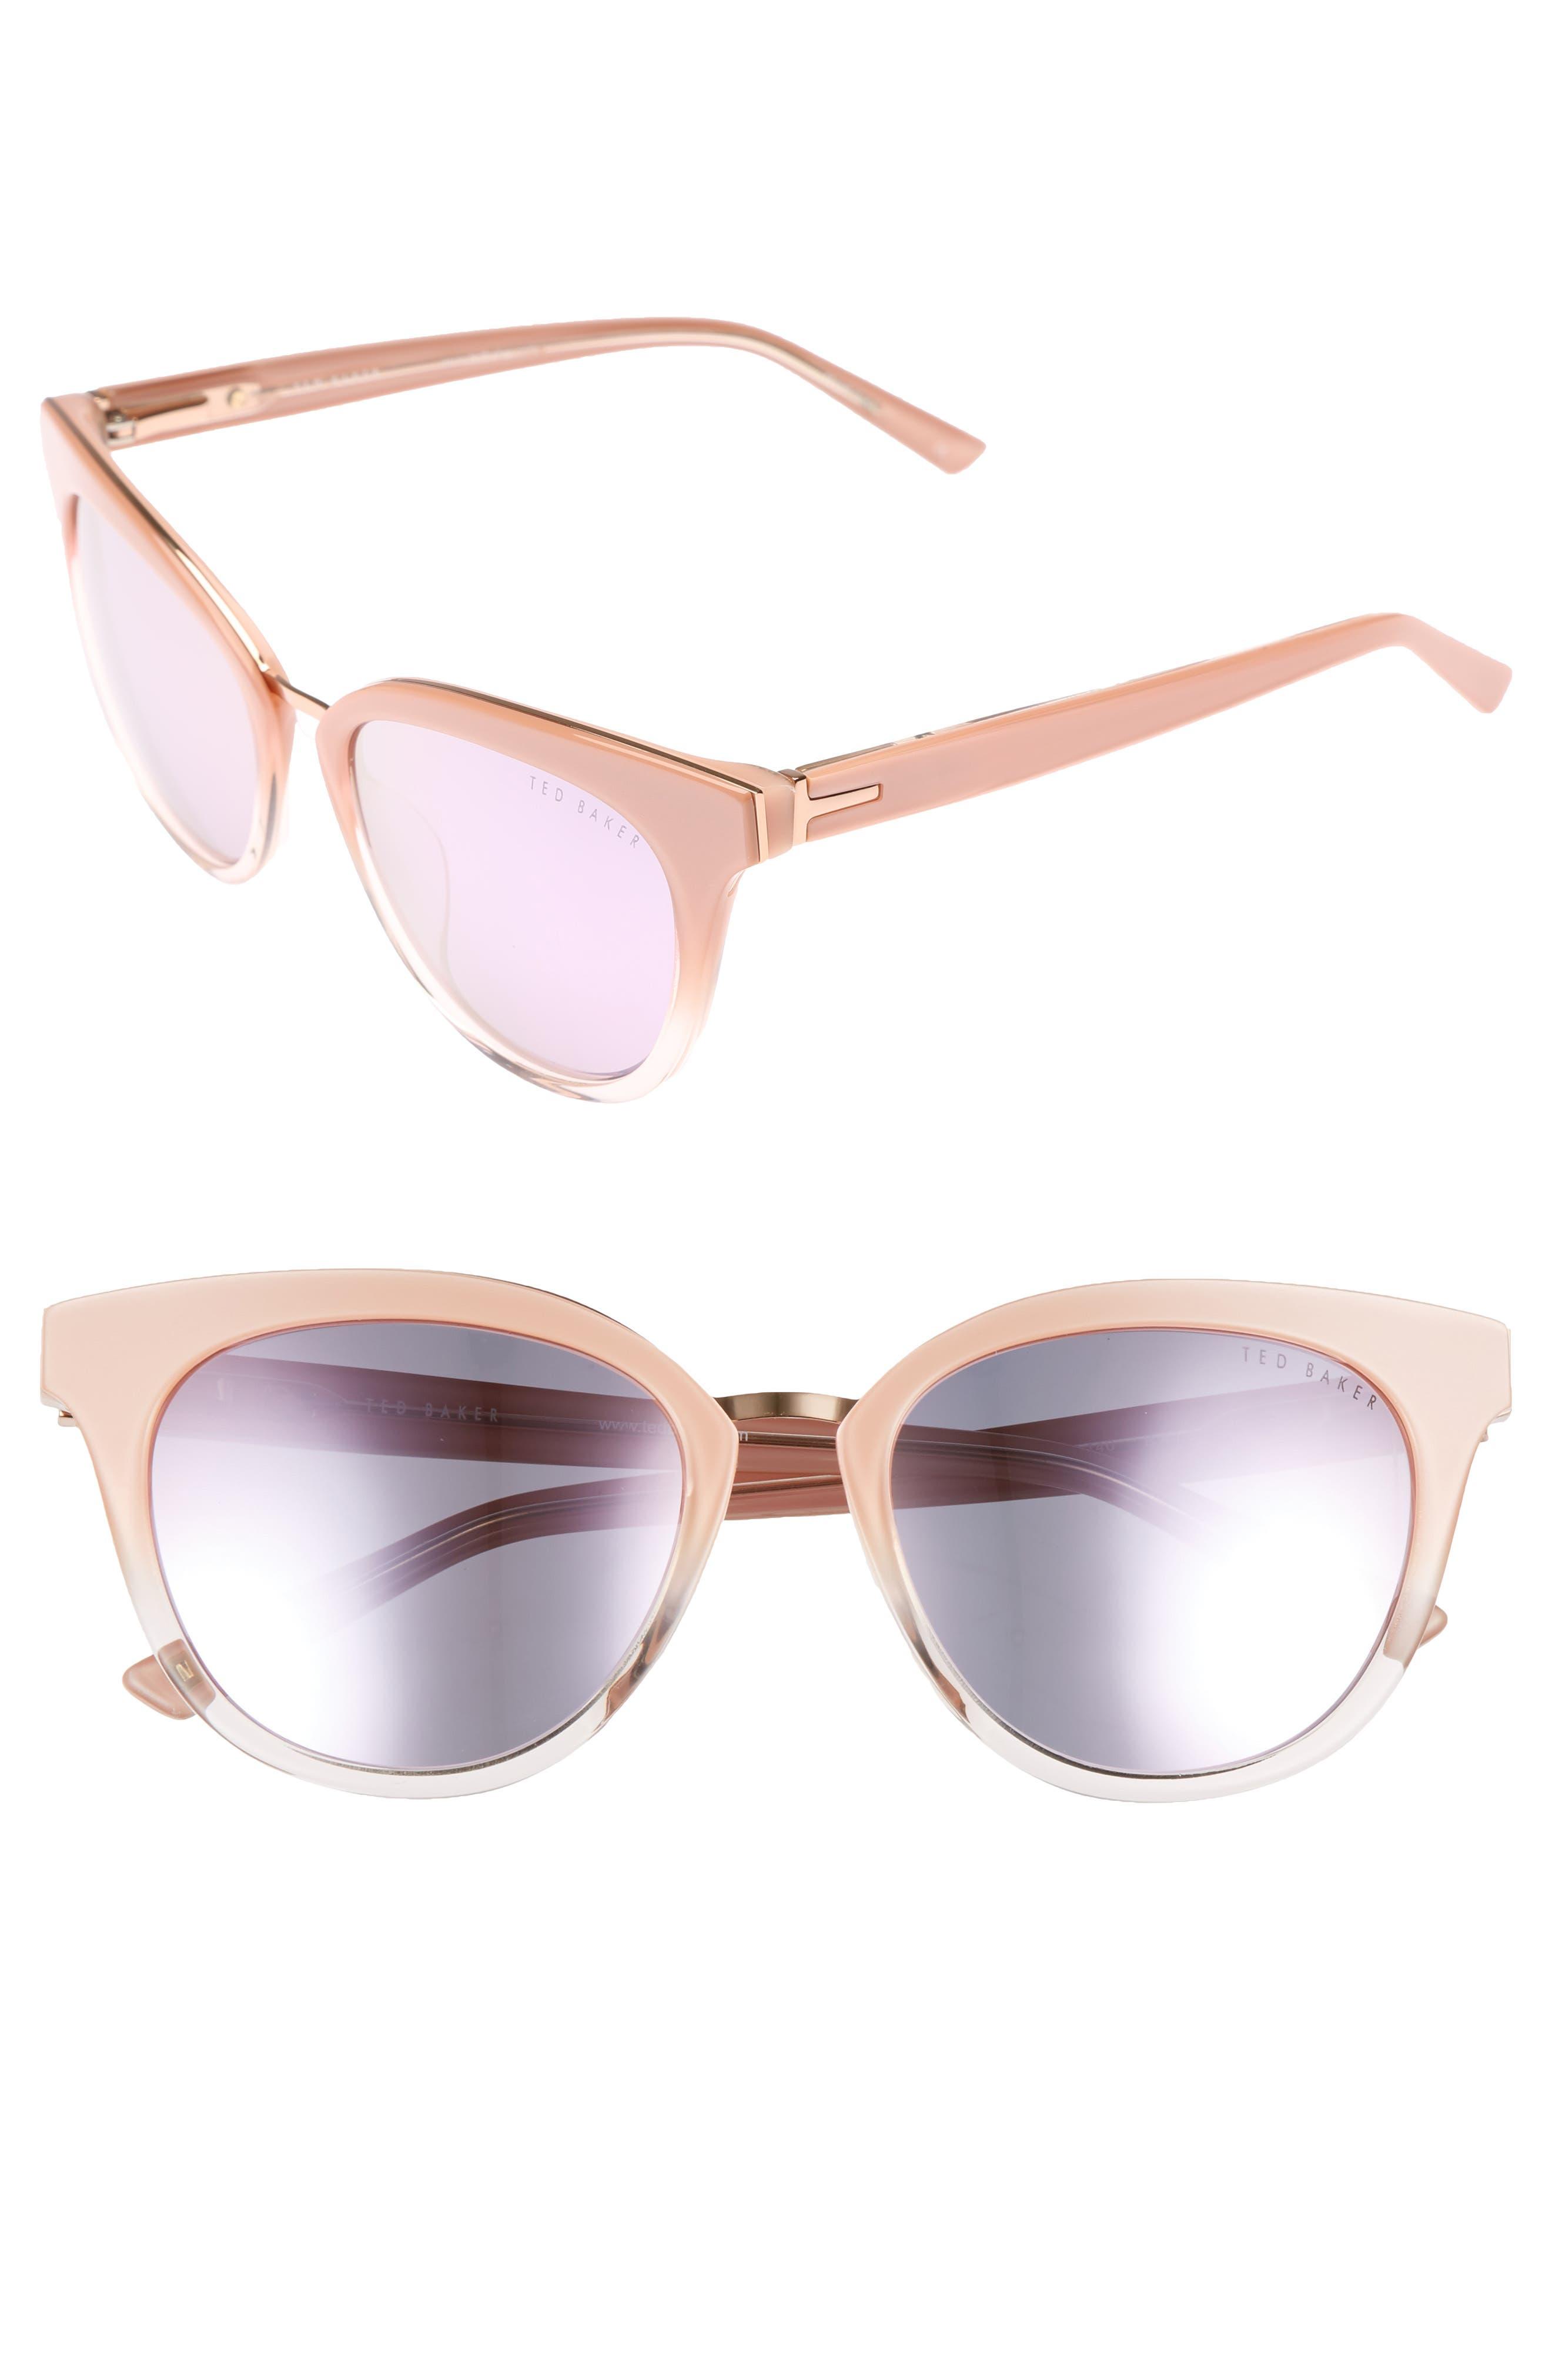 53mm Cat Eye Sunglasses,                         Main,                         color, Blush